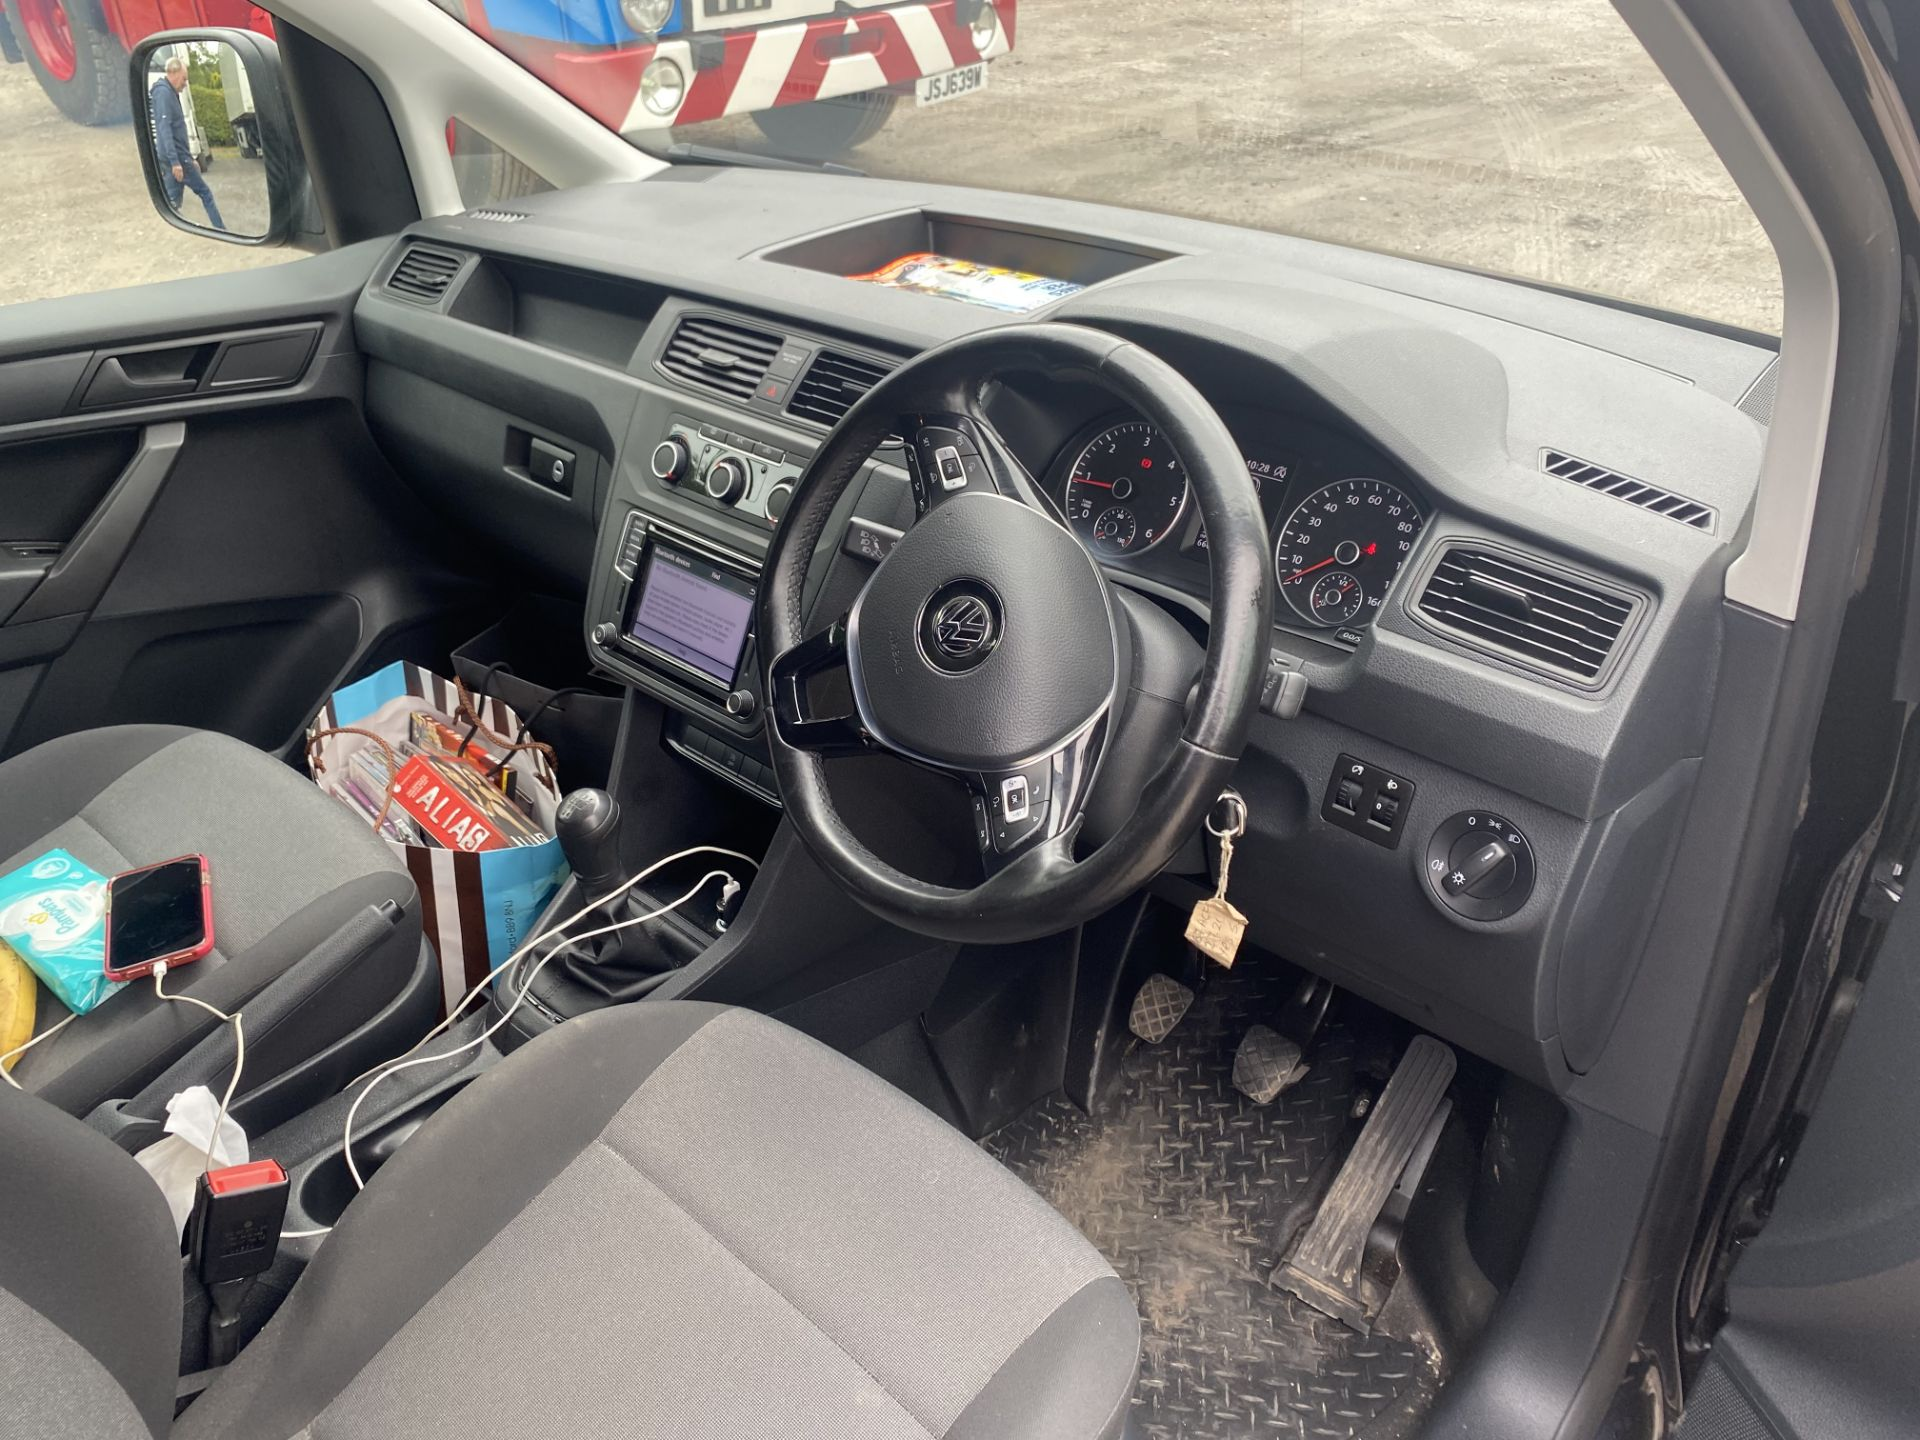 Volkswagen CADDY MAXI C20 2.0 TDI KOMBI VAN, registration no. EJ67 ACF, date first registered 20/ - Image 6 of 11